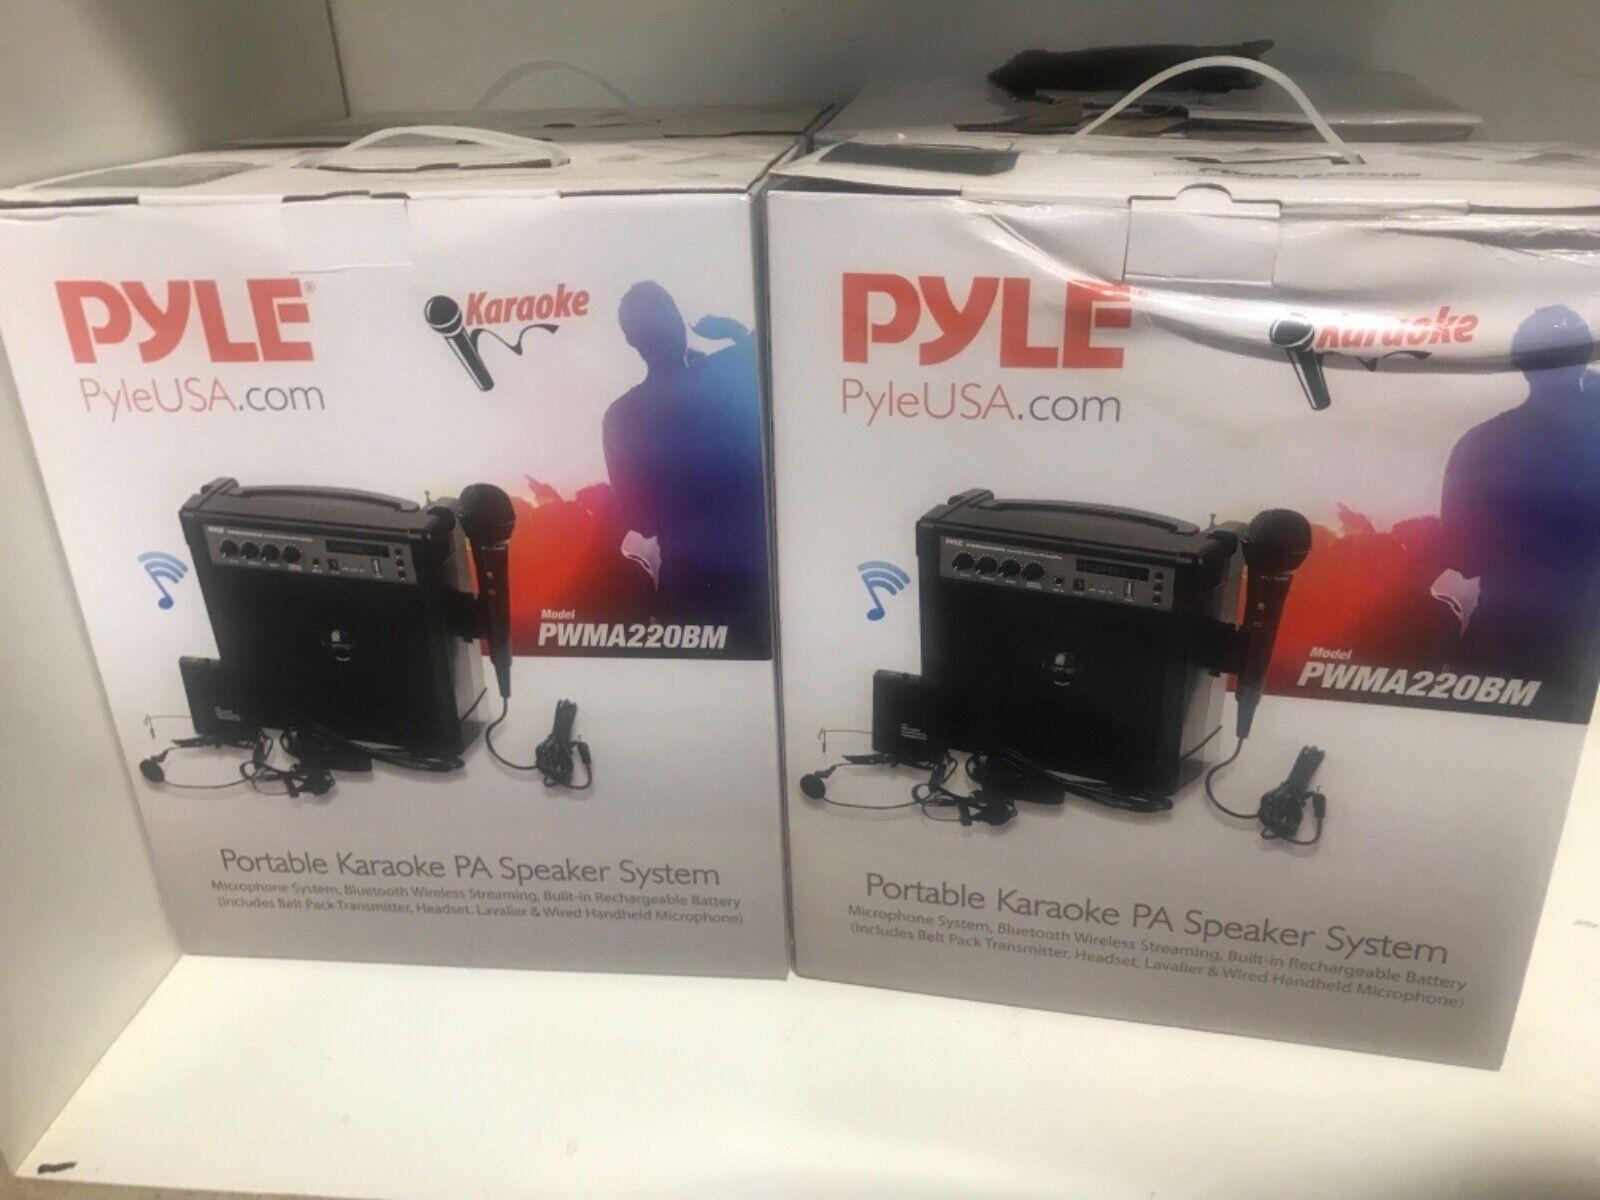 Pyle PWMA220BM Portable Karaoke PA Speaker System